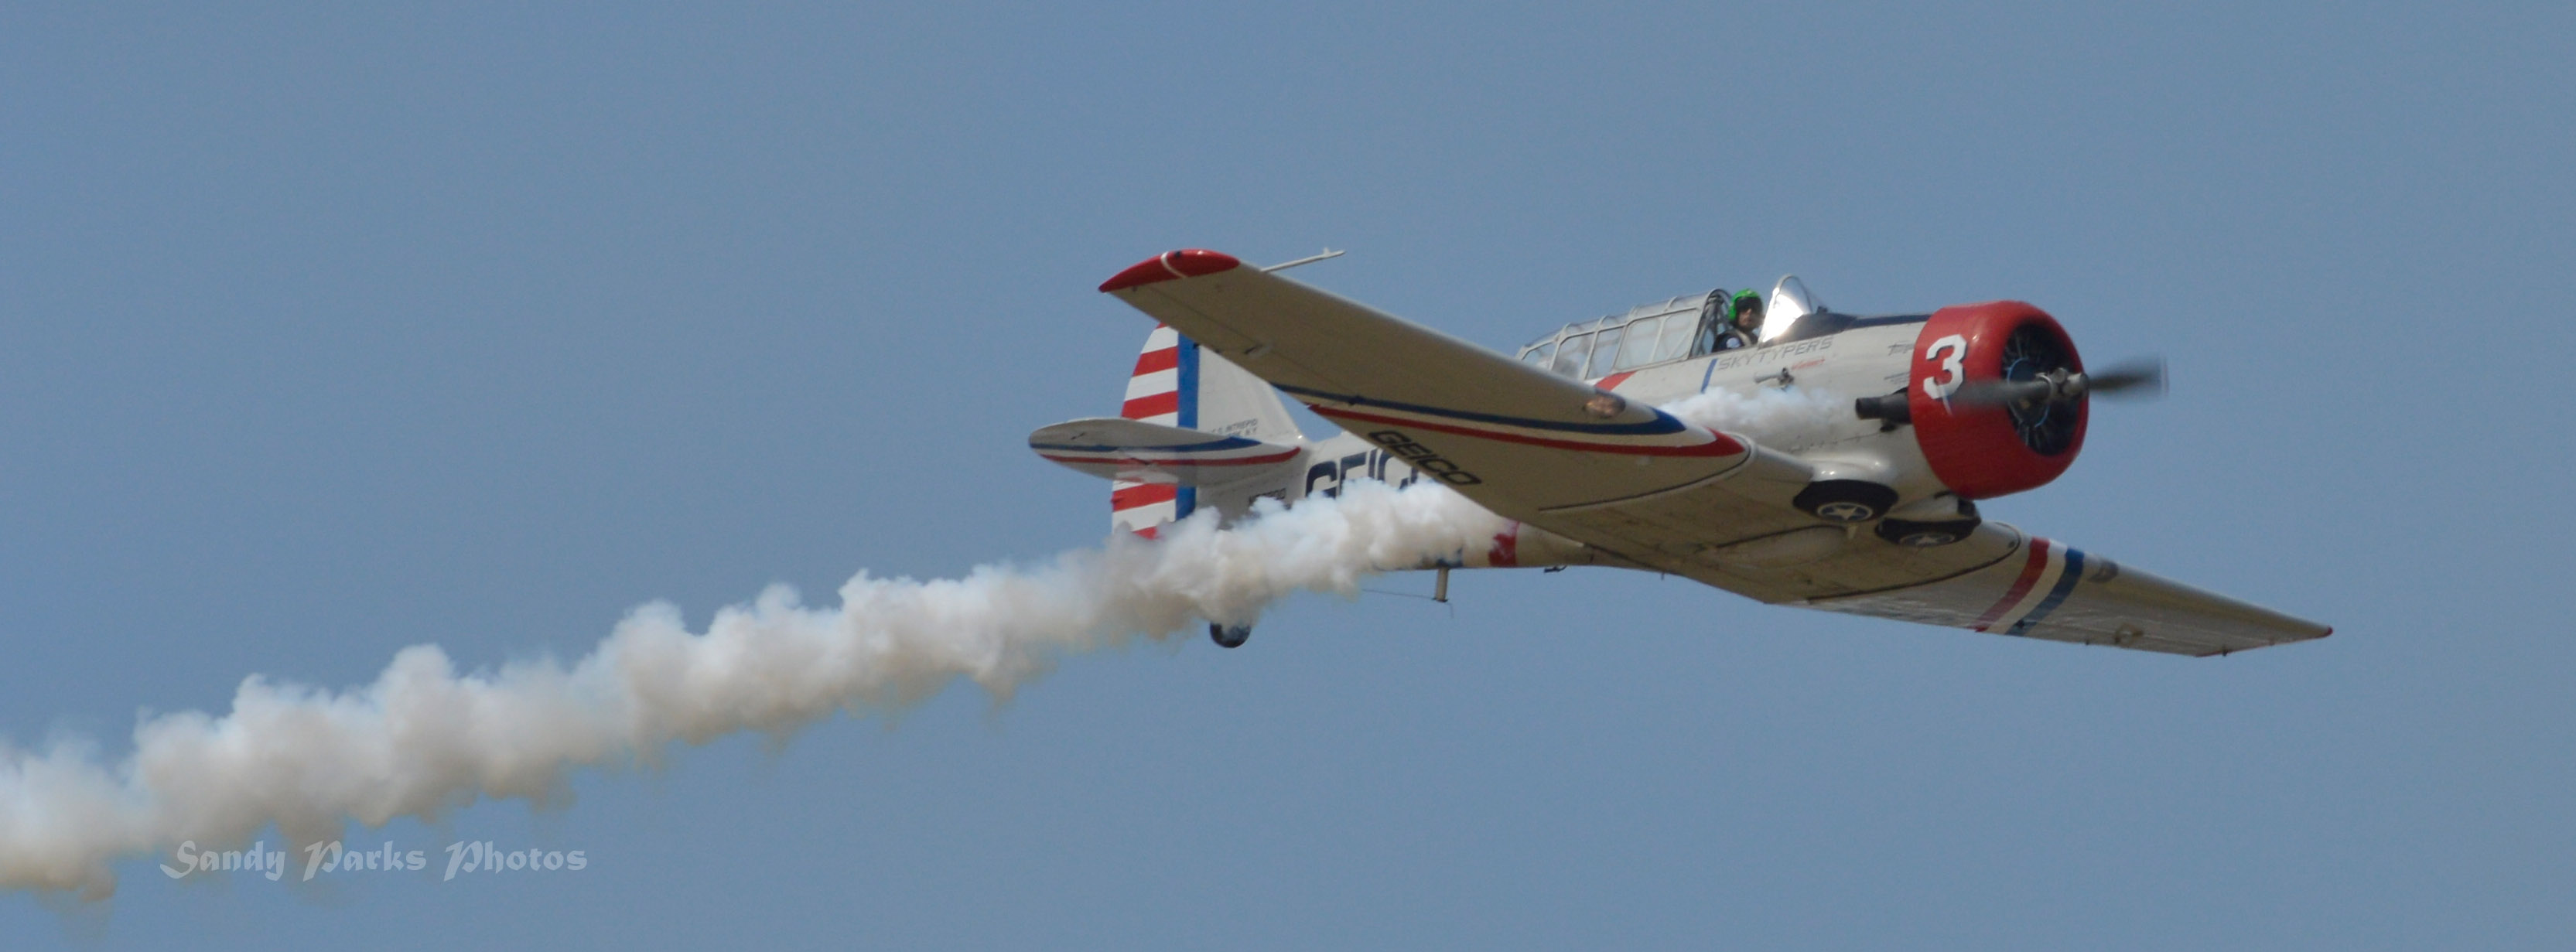 T-6 Warbird